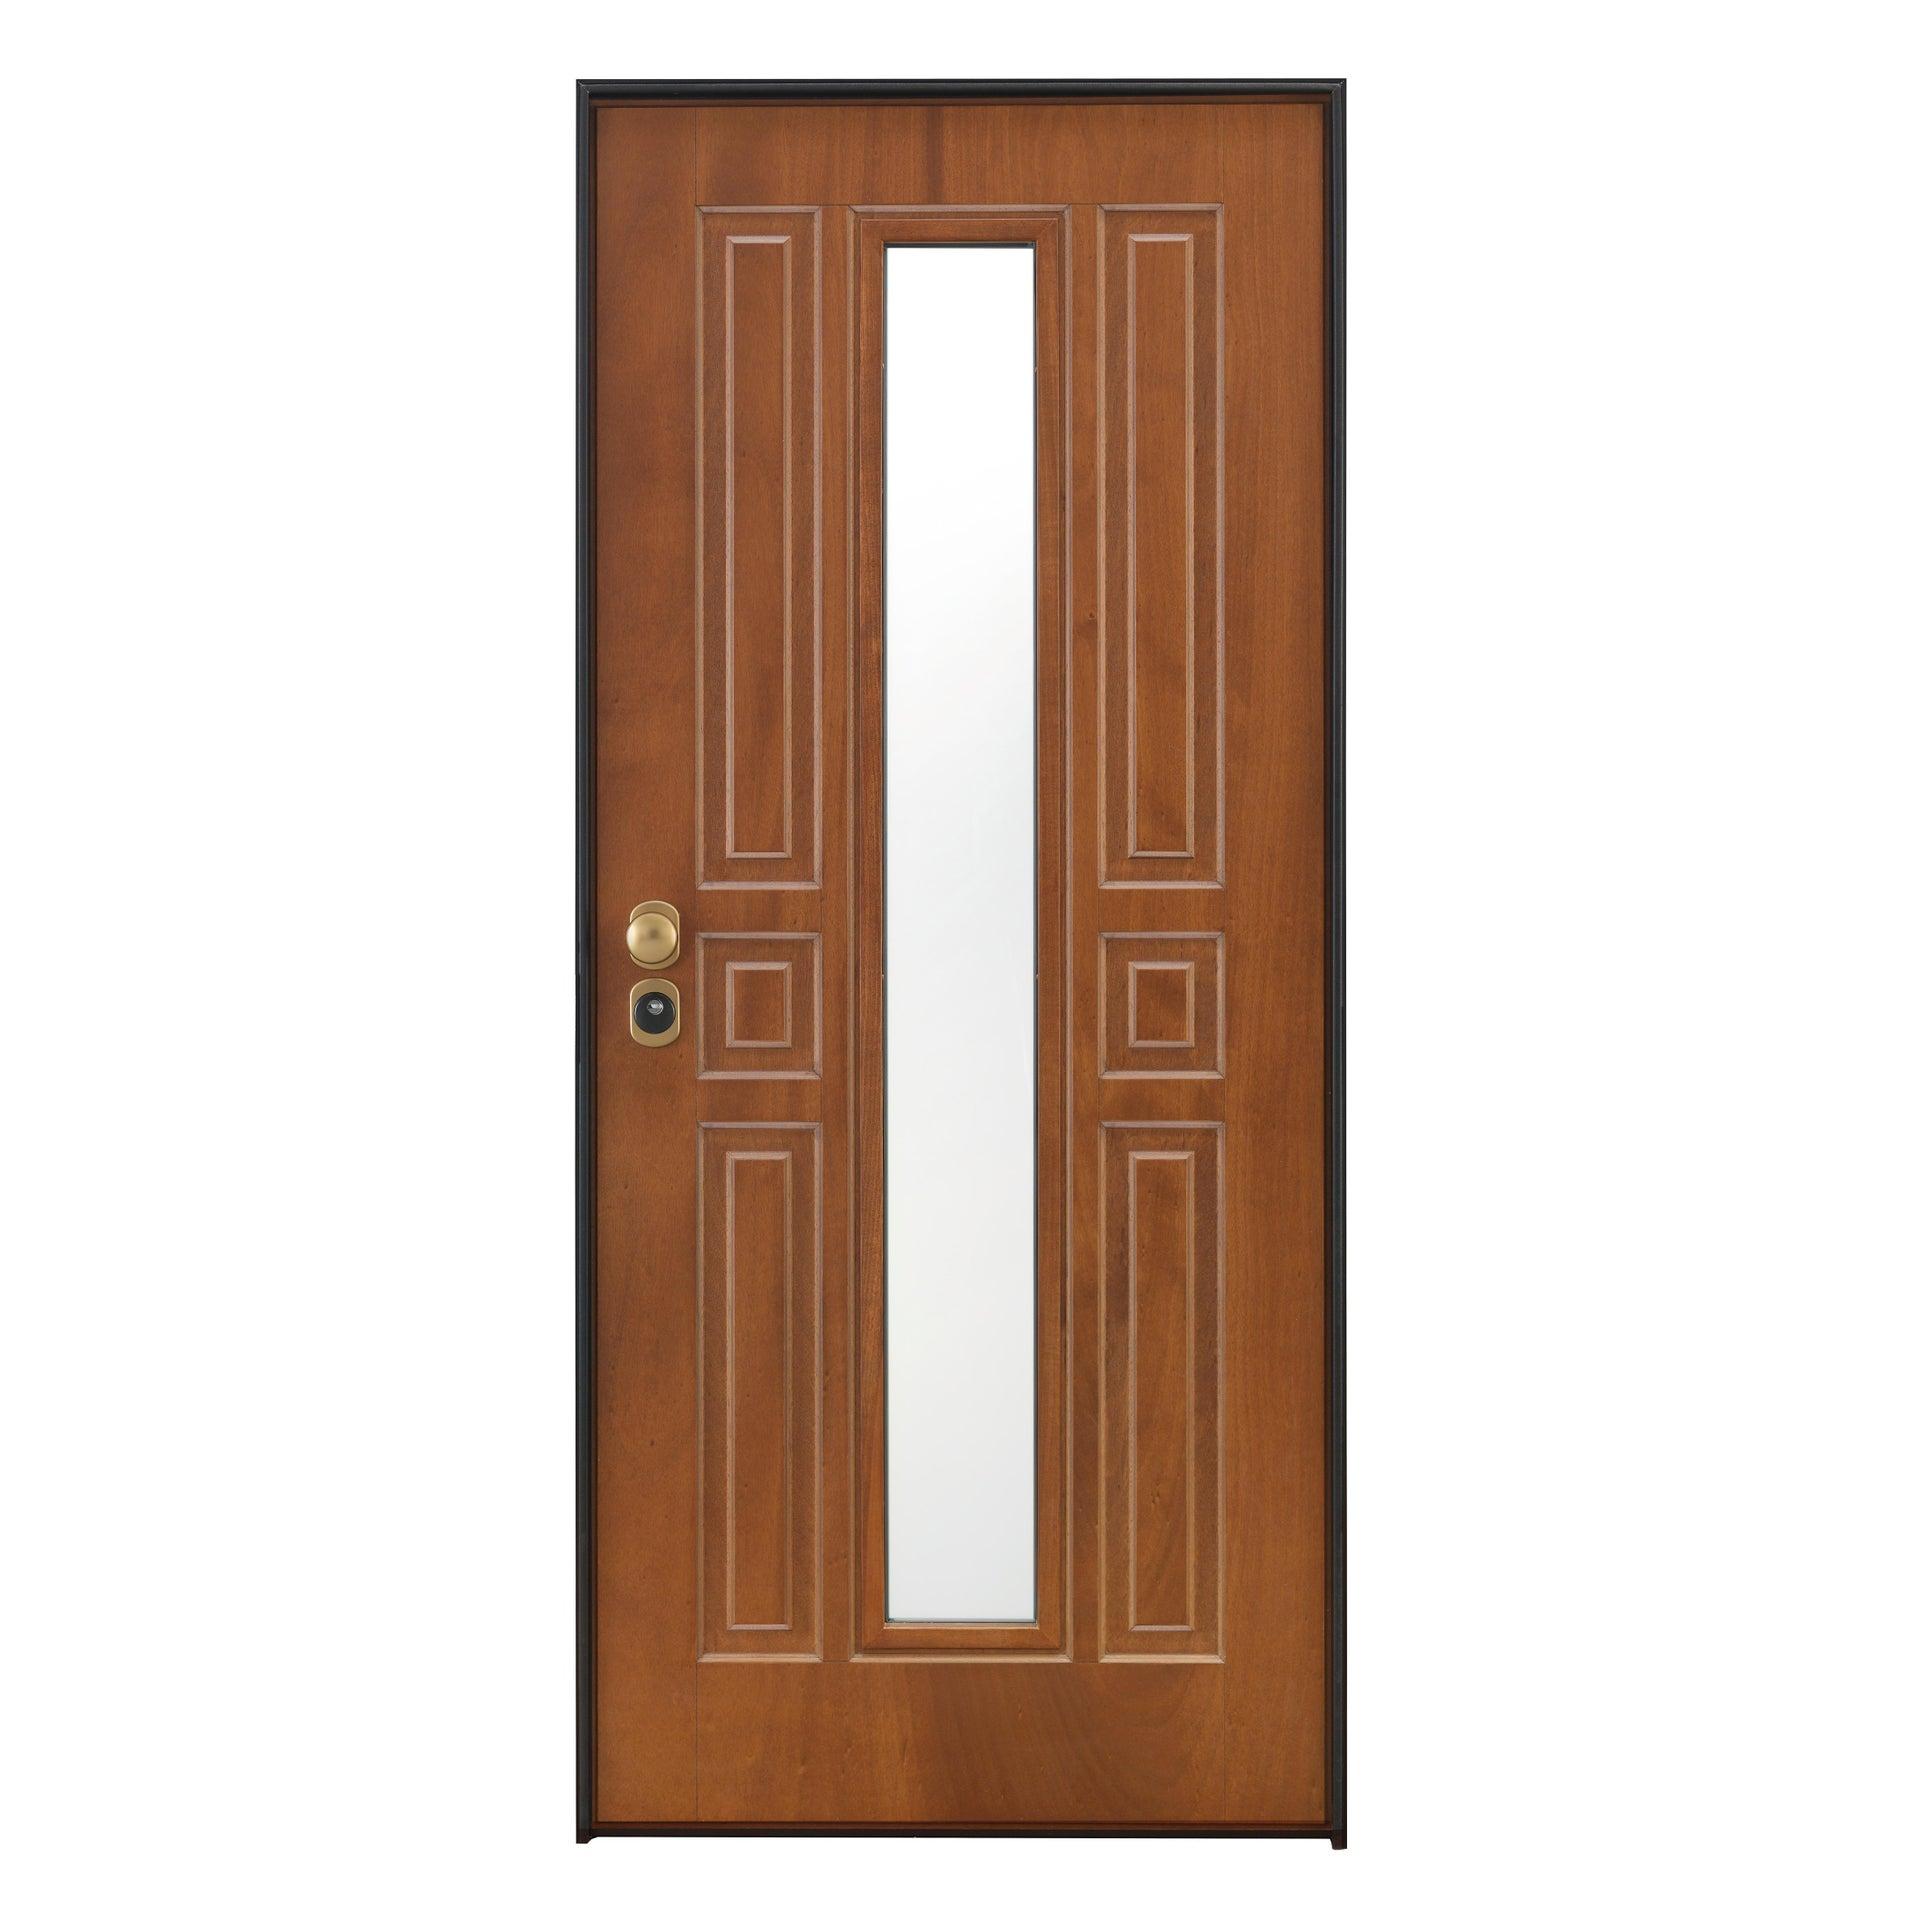 Porta blindata Mirror noce L 90 x H 210 cm destra - 5